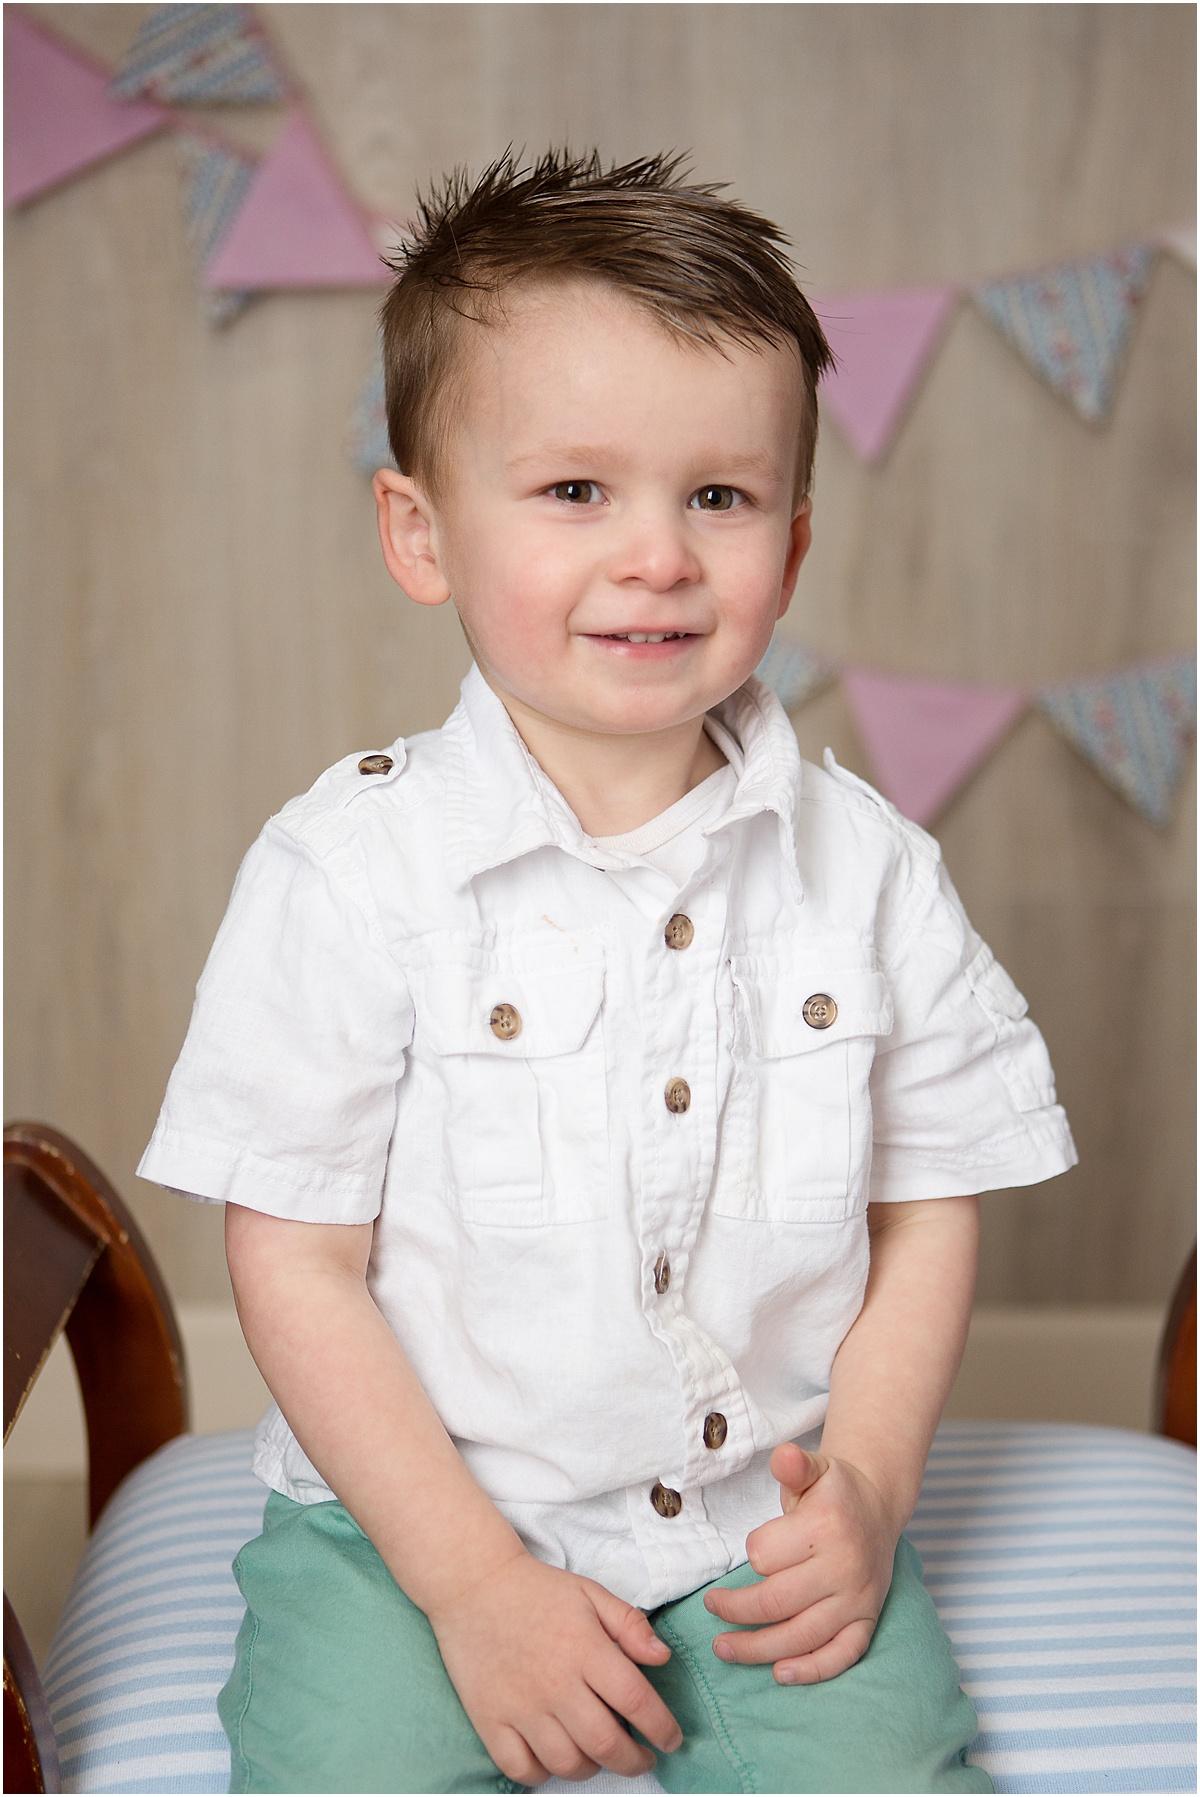 Portraits_Child Photography_Meridian Idaho__Leah Southwick Photography_0034.jpg